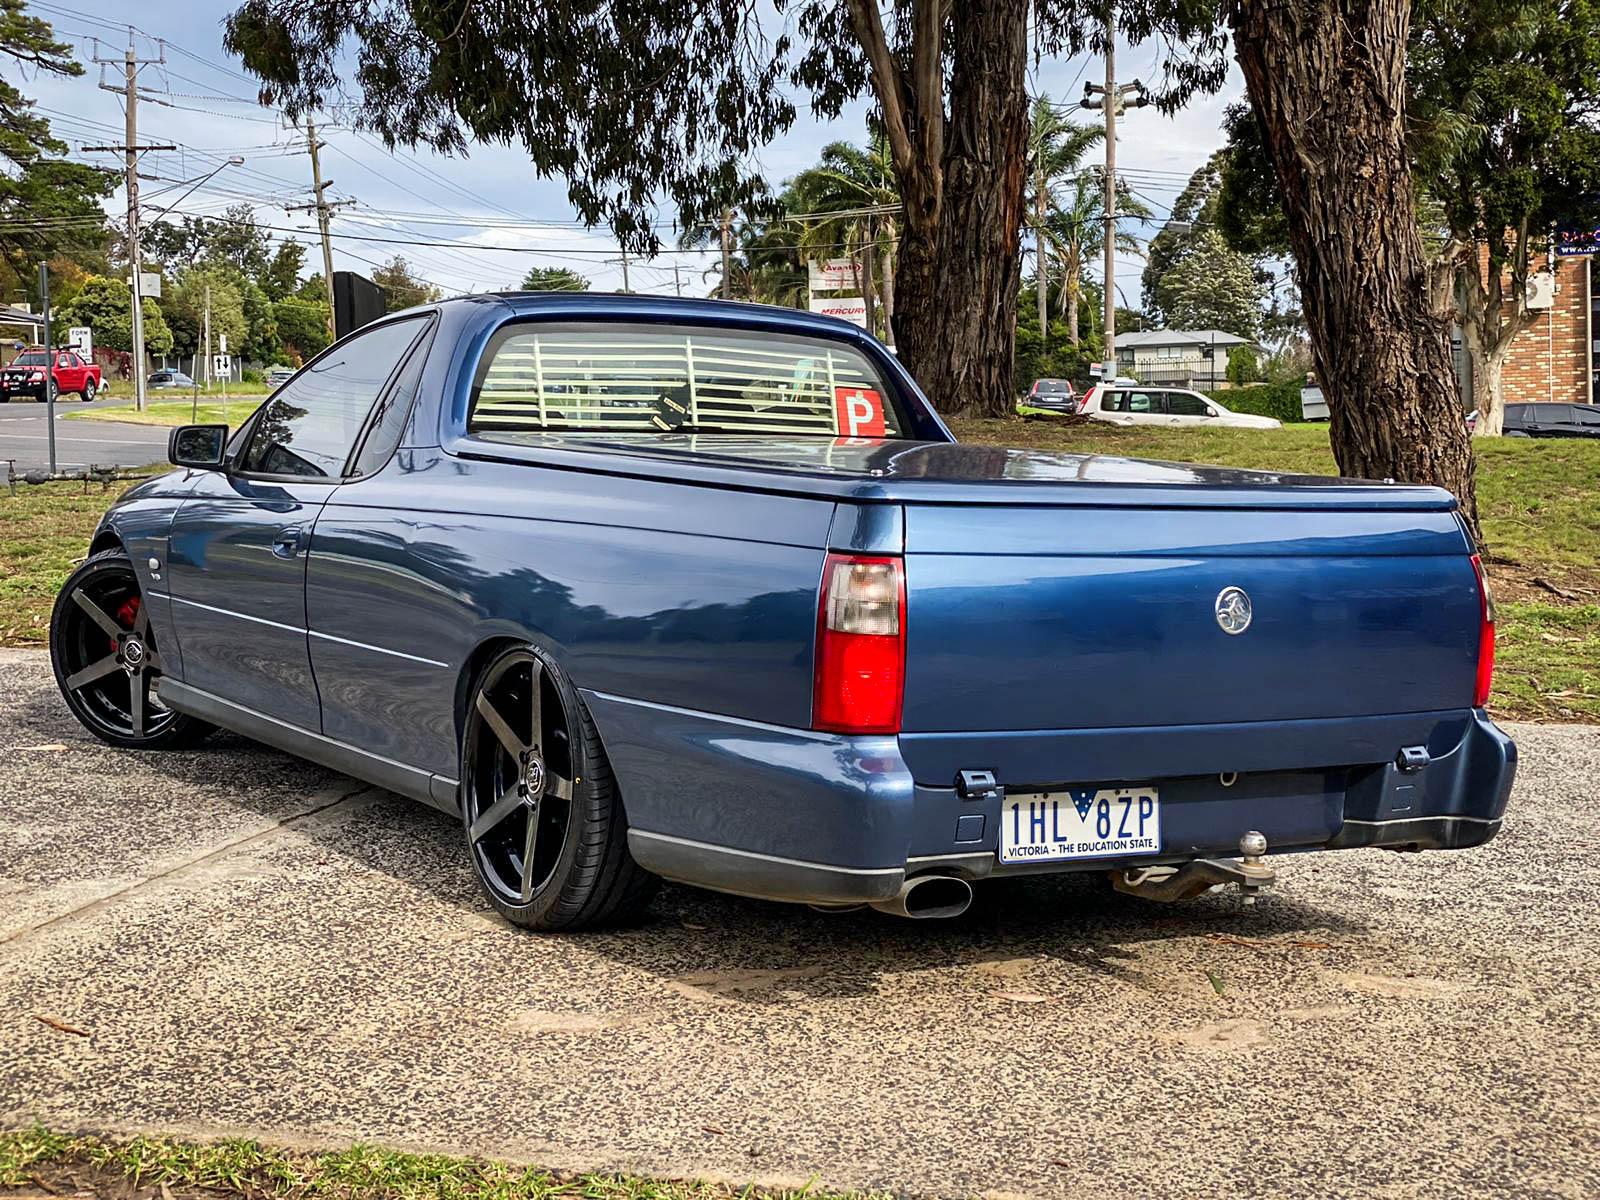 Holden commodore on hussla zane dark tint5